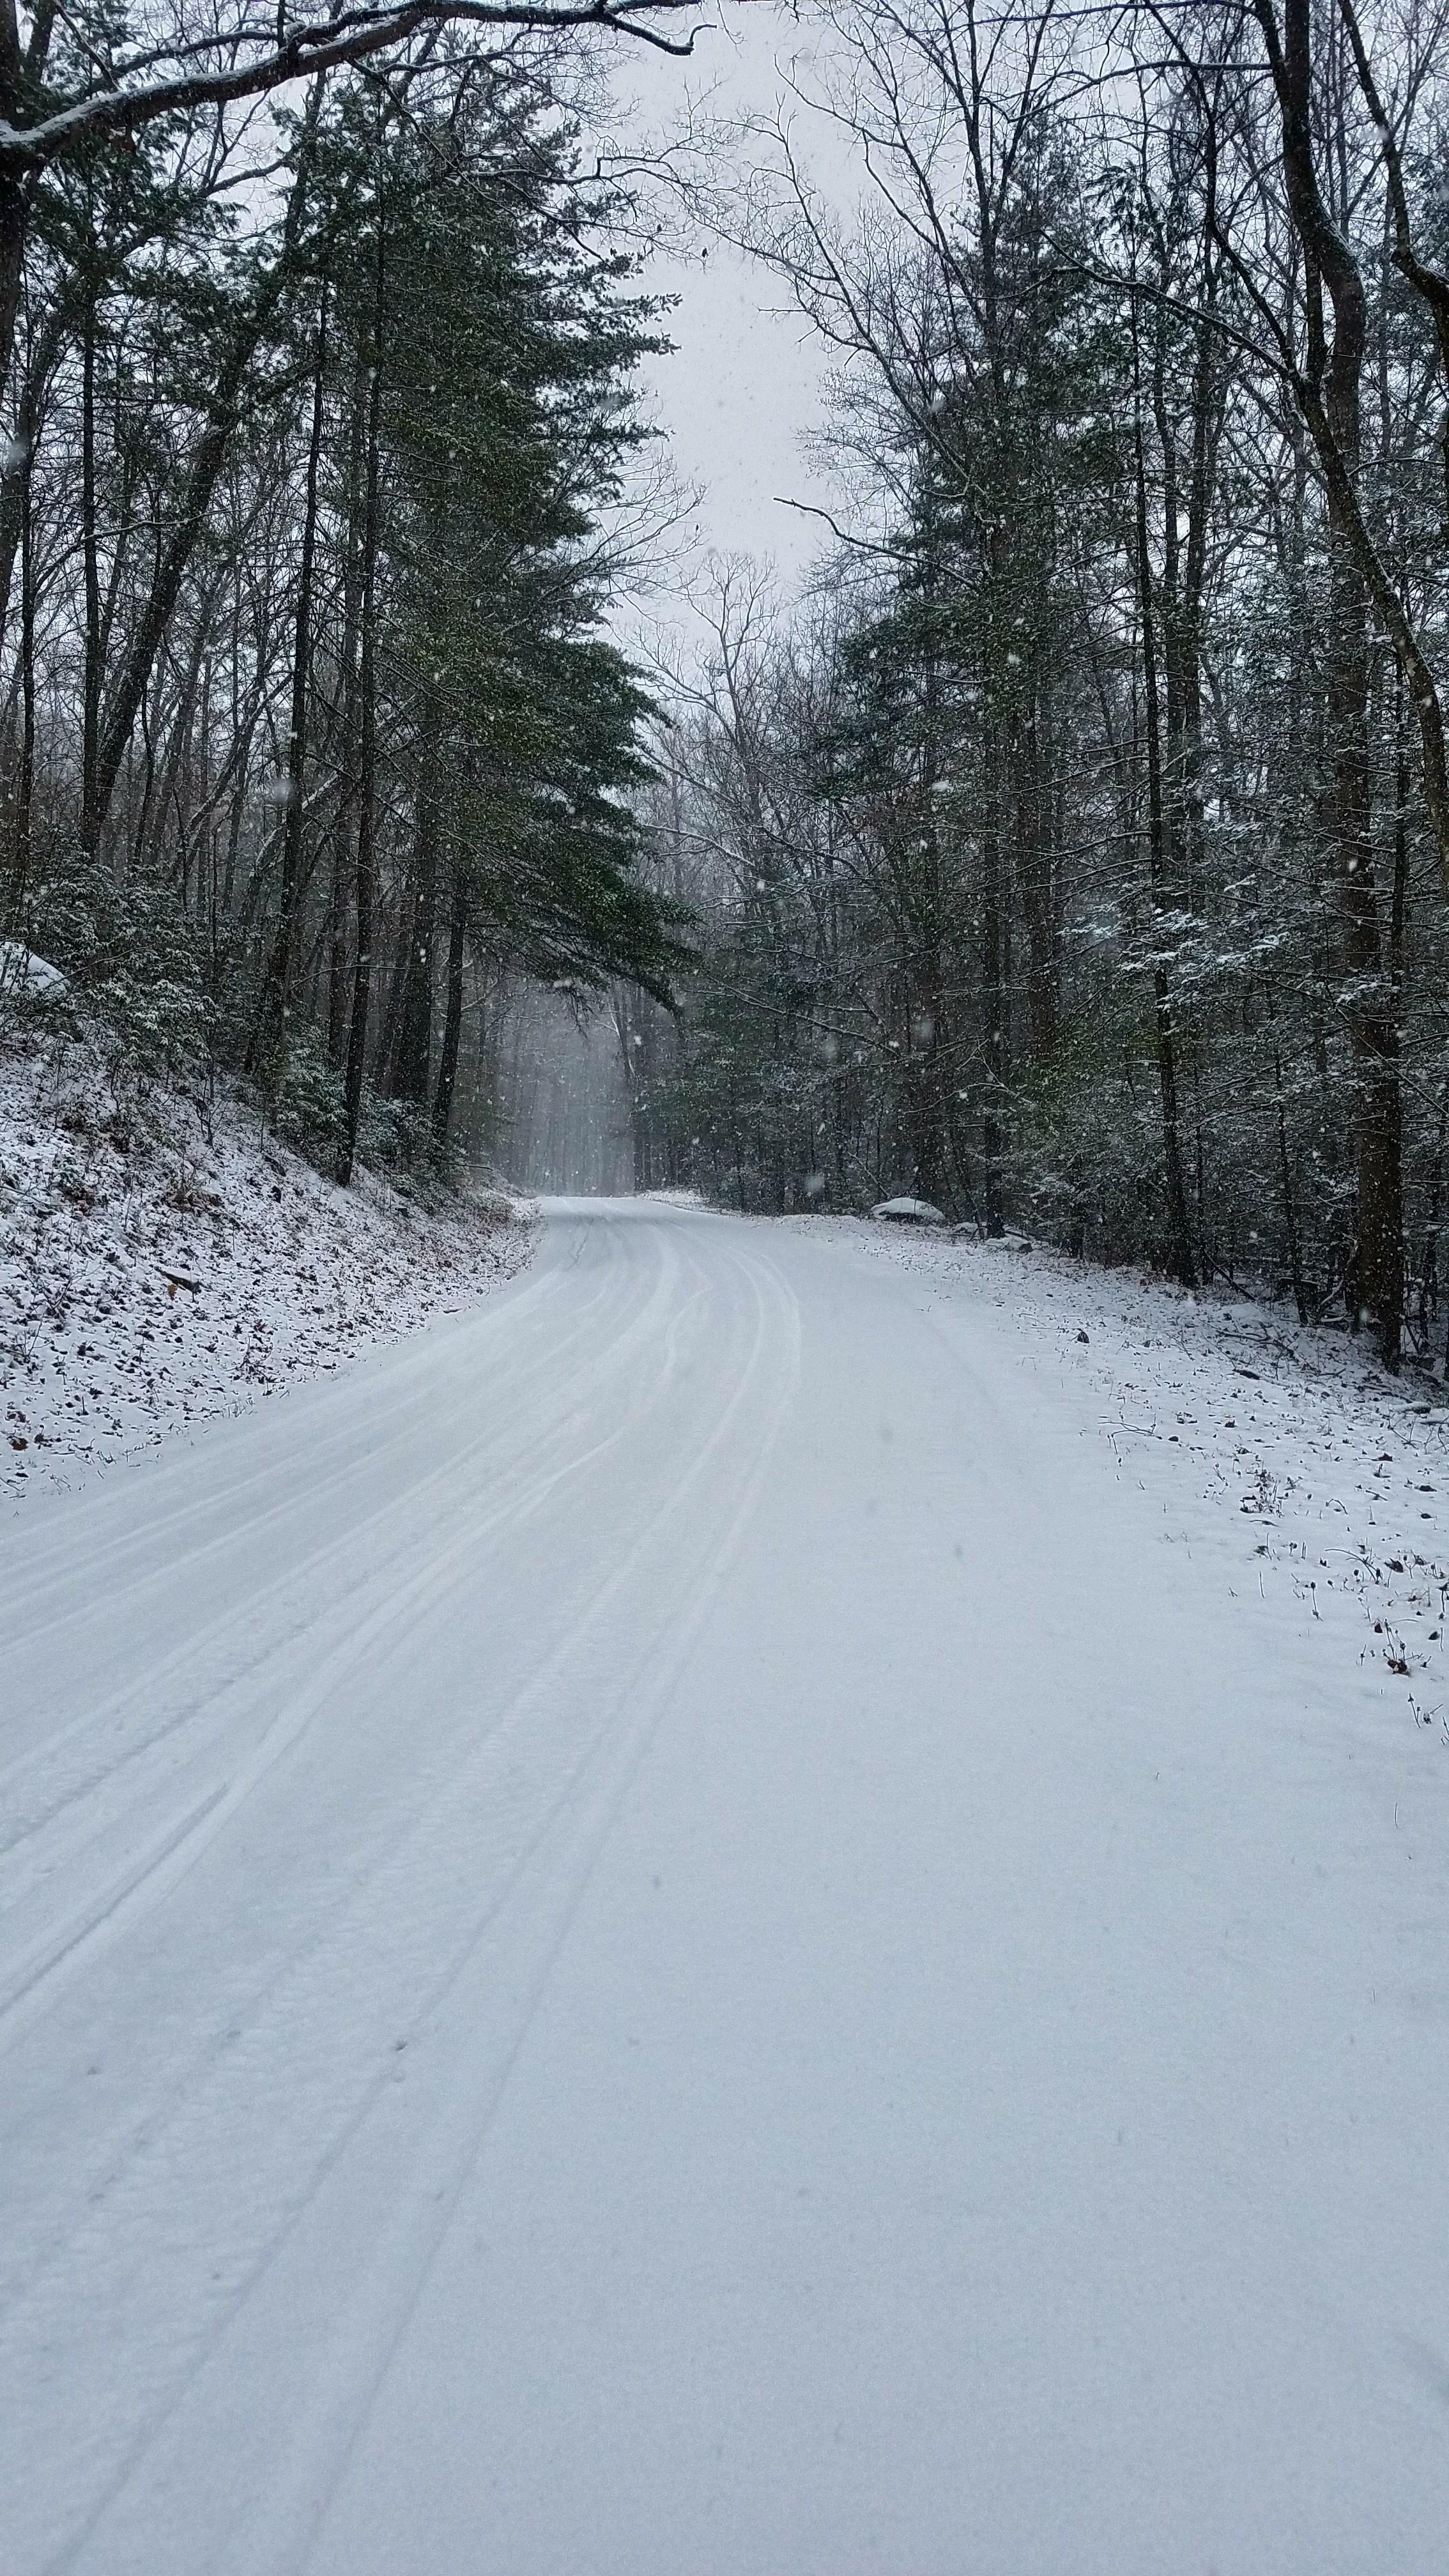 Snowy tree tunnel